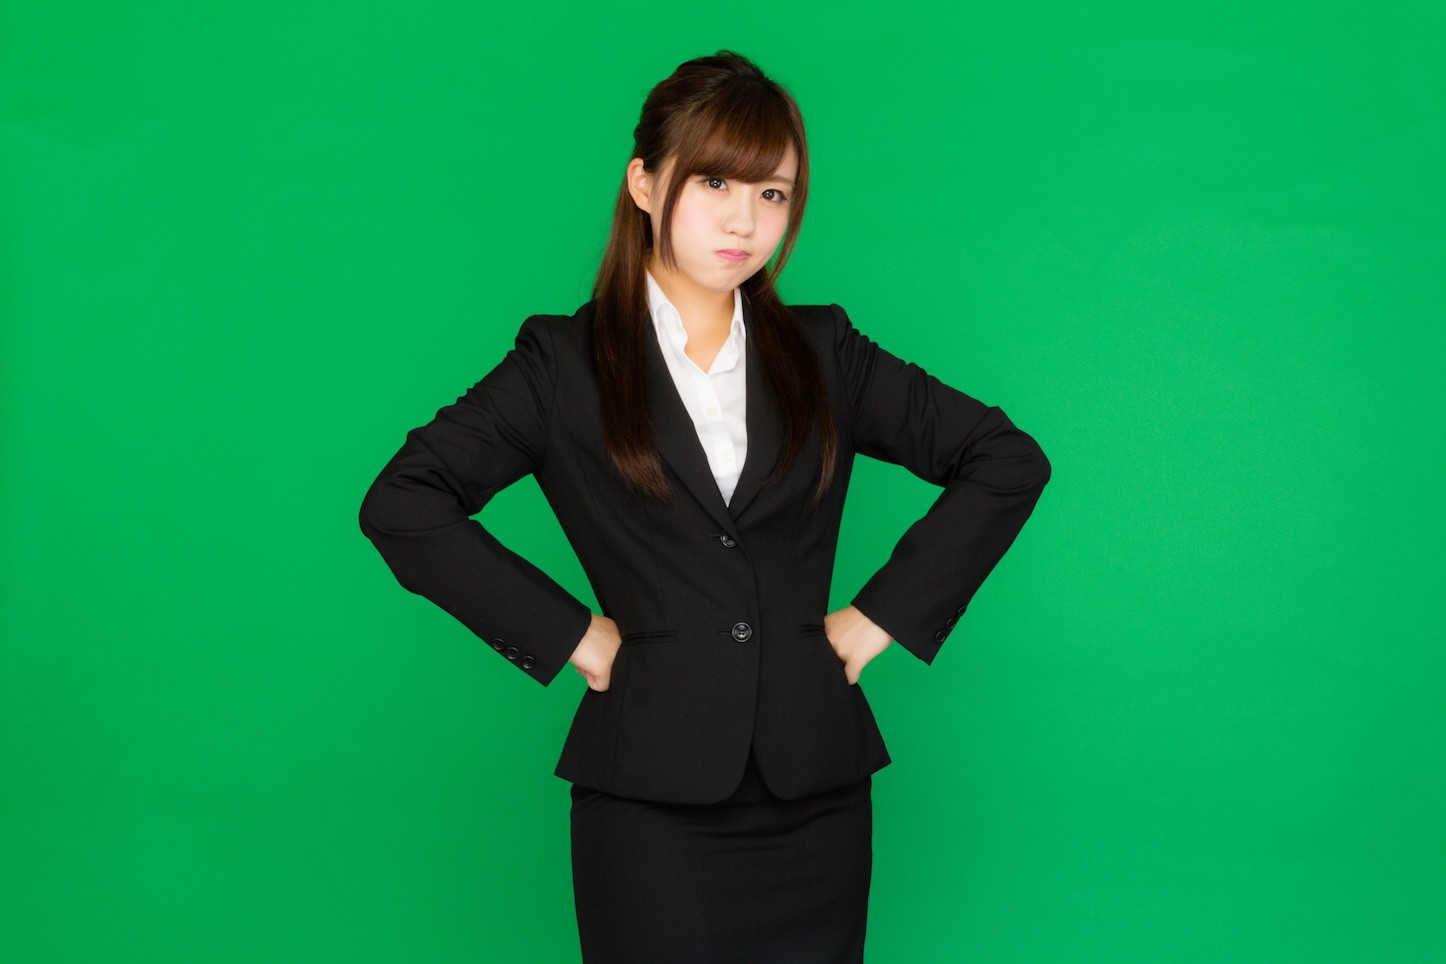 yuka-kawamura-greenback-1.jpg